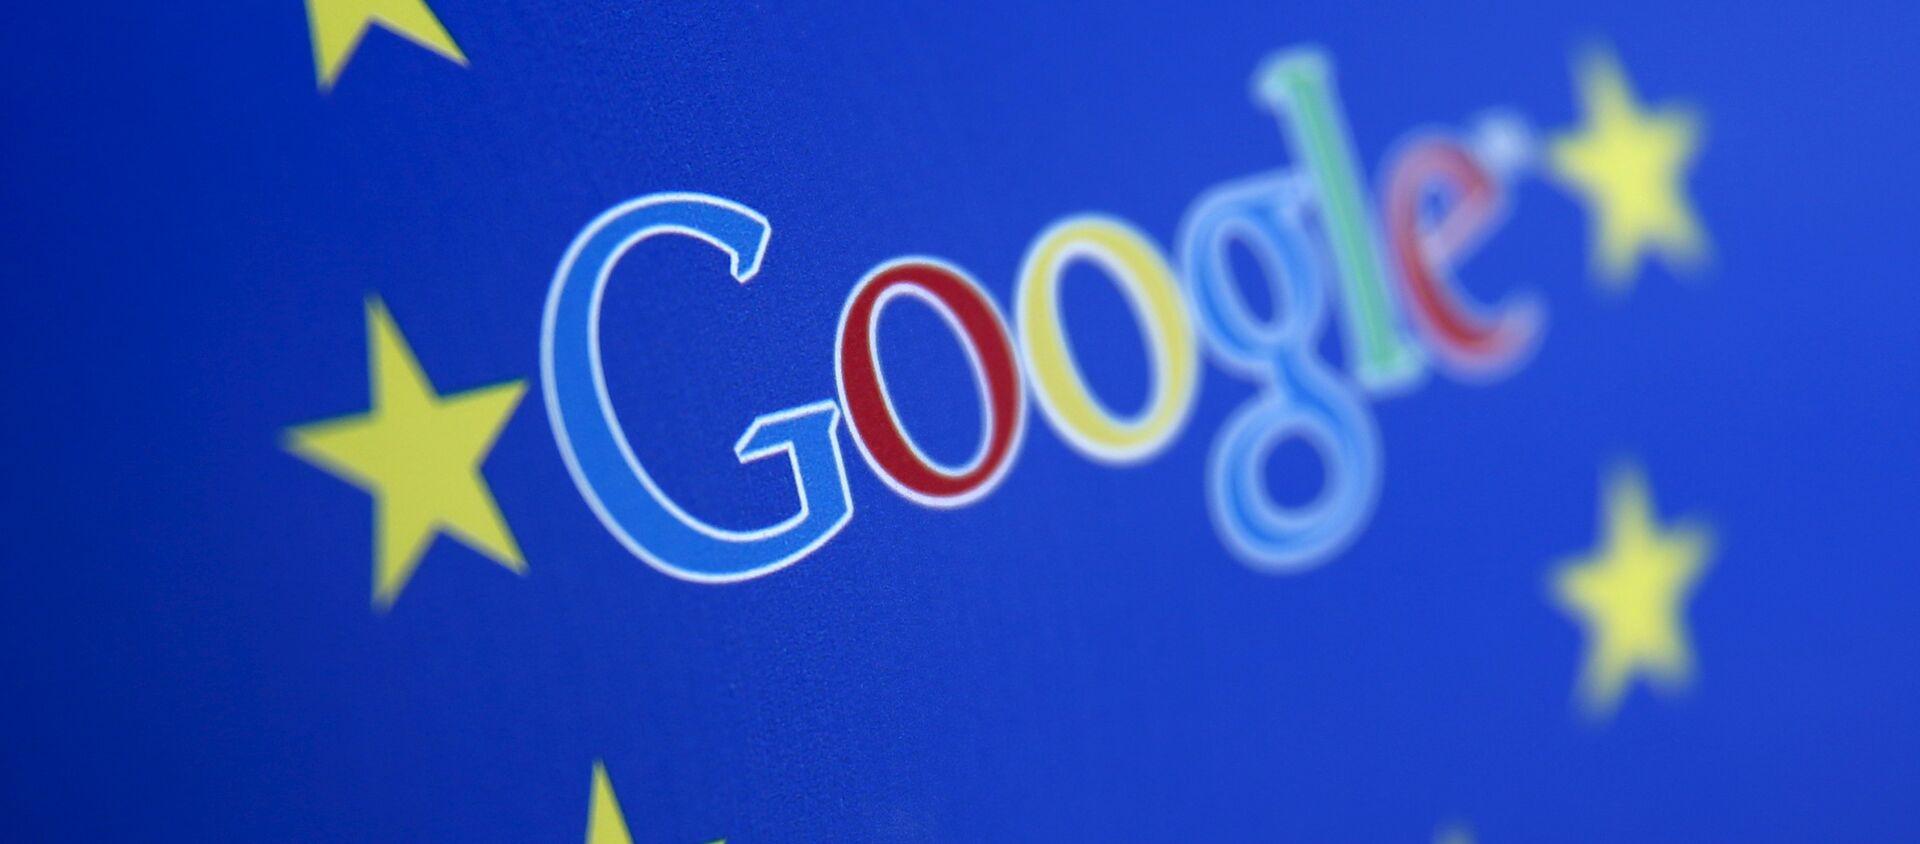 Logo di Google e l'Unione Europea - Sputnik Italia, 1920, 13.05.2021